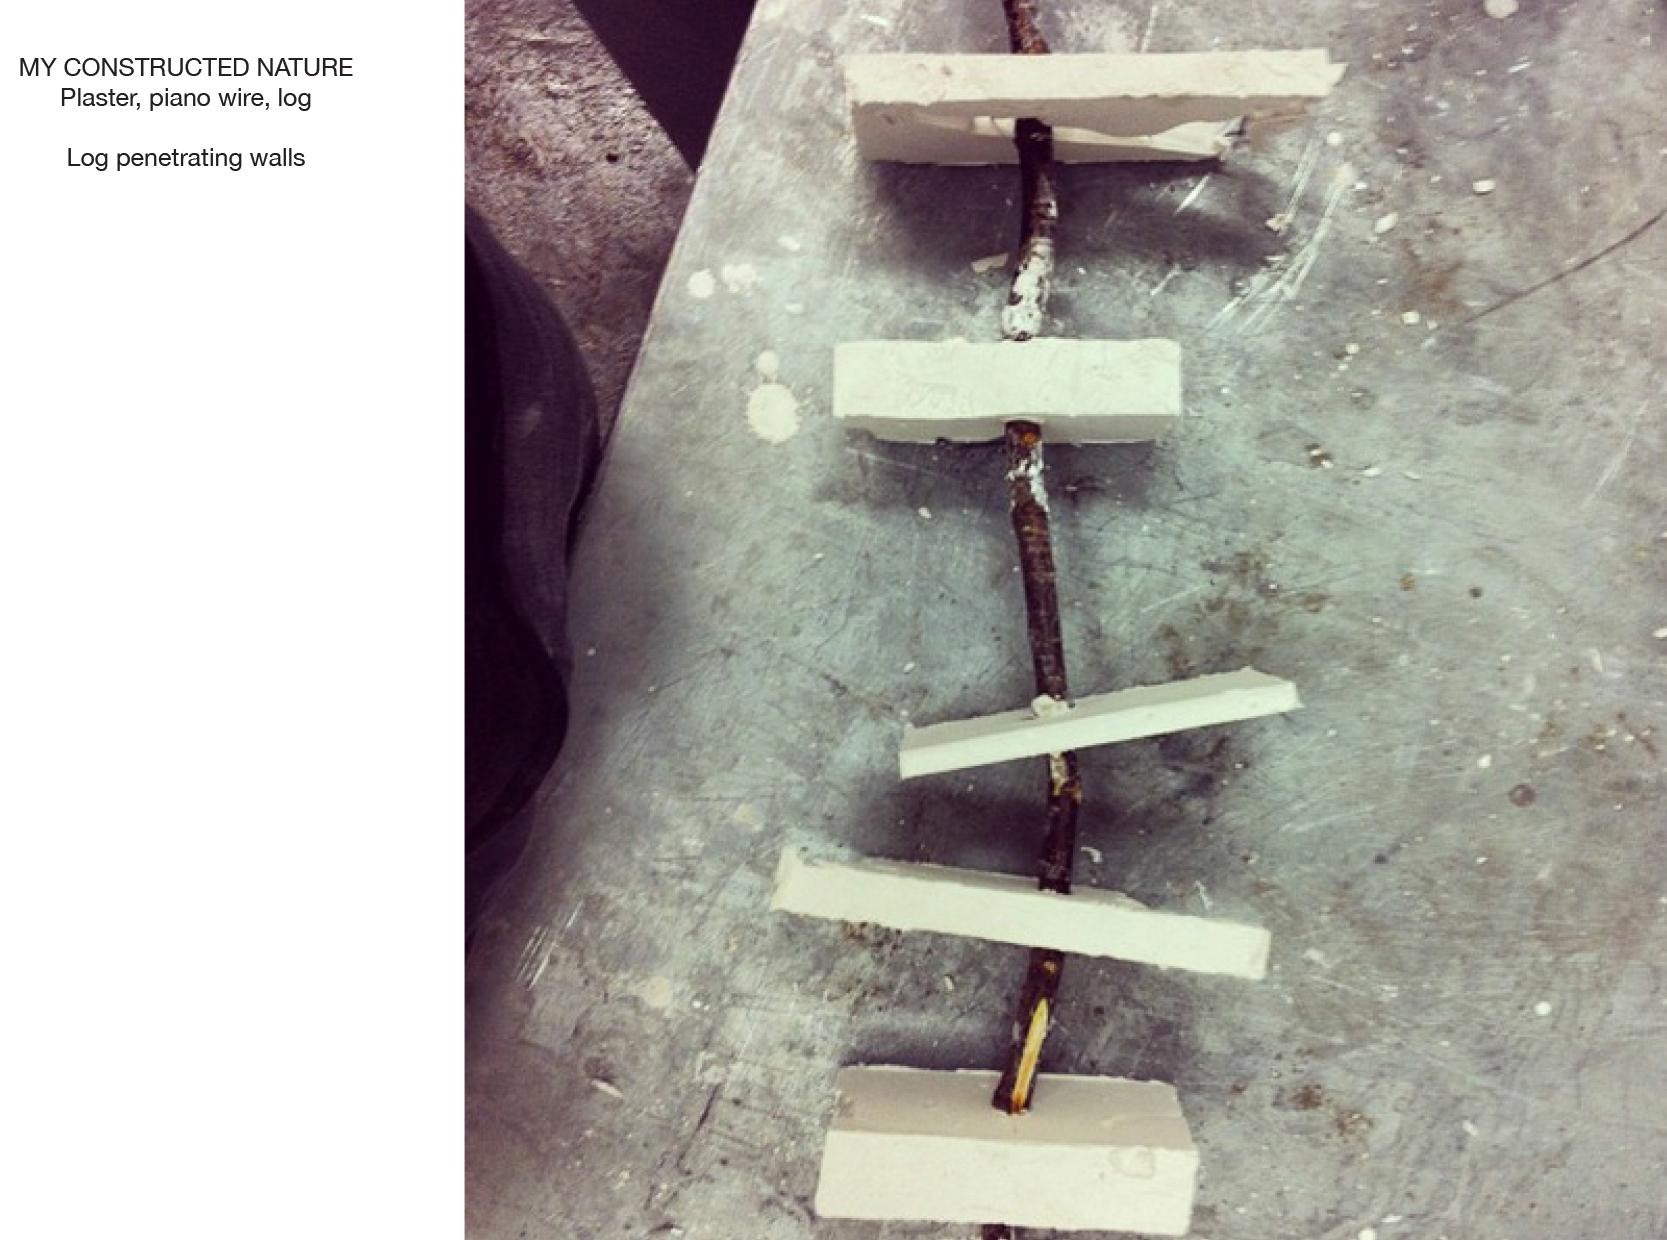 Fruergaard-Victor_2014-Fall-CCA-Perceptual-Shifts_Process-Prints-4.jpg